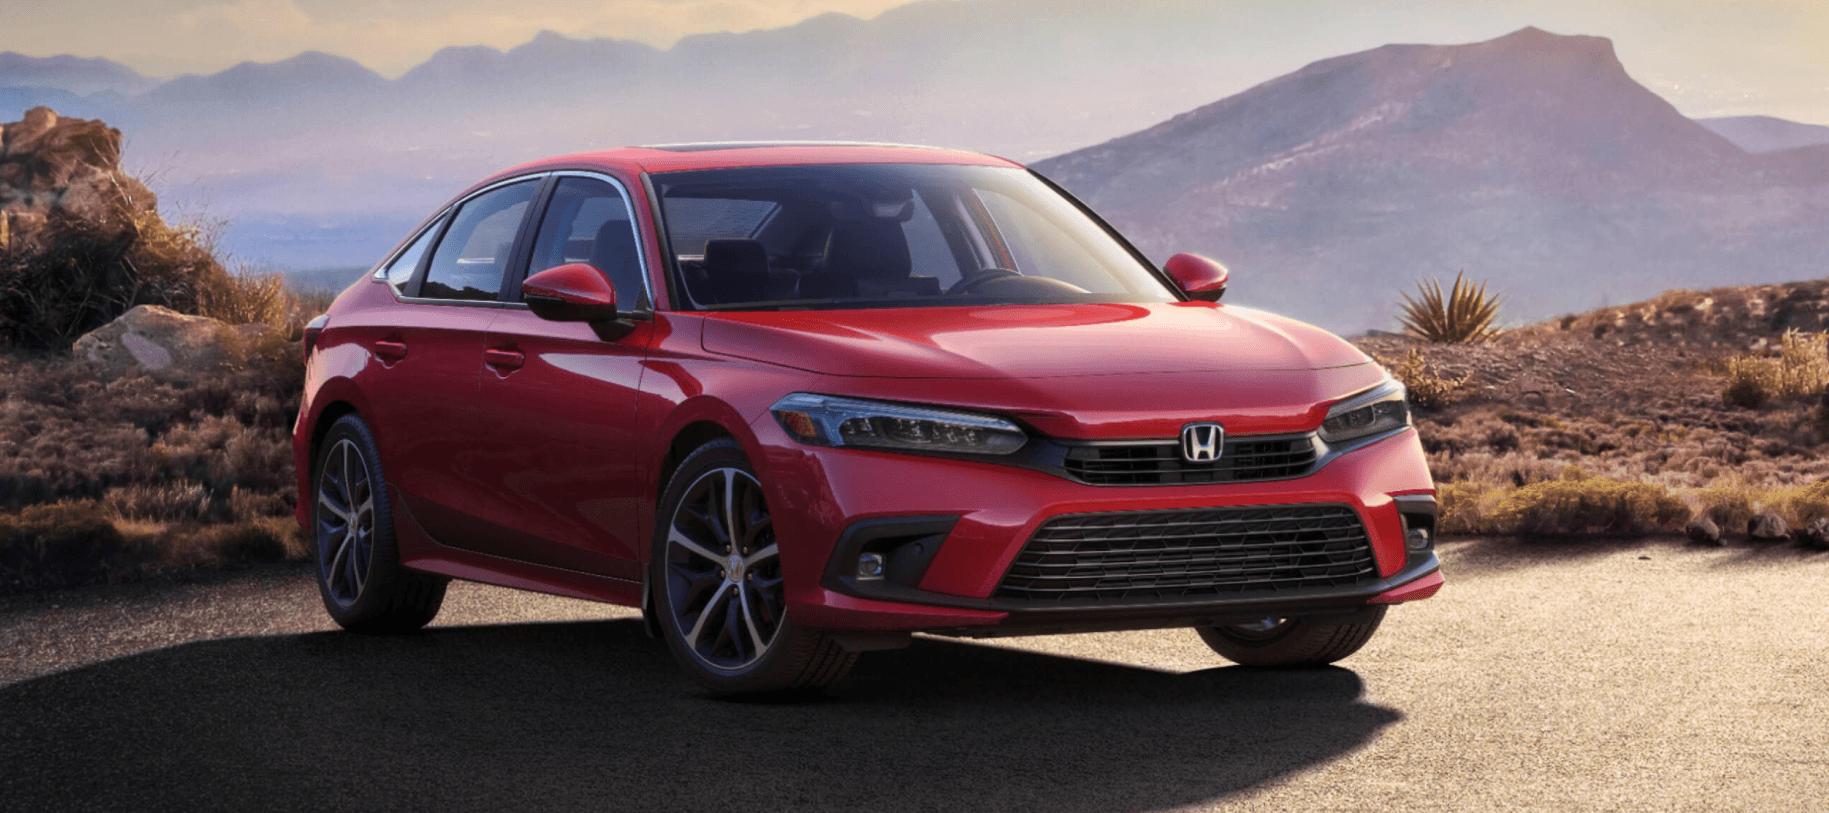 2022 Honda Civic Performance at Richmond Hill Honda in Toronto and the GTA